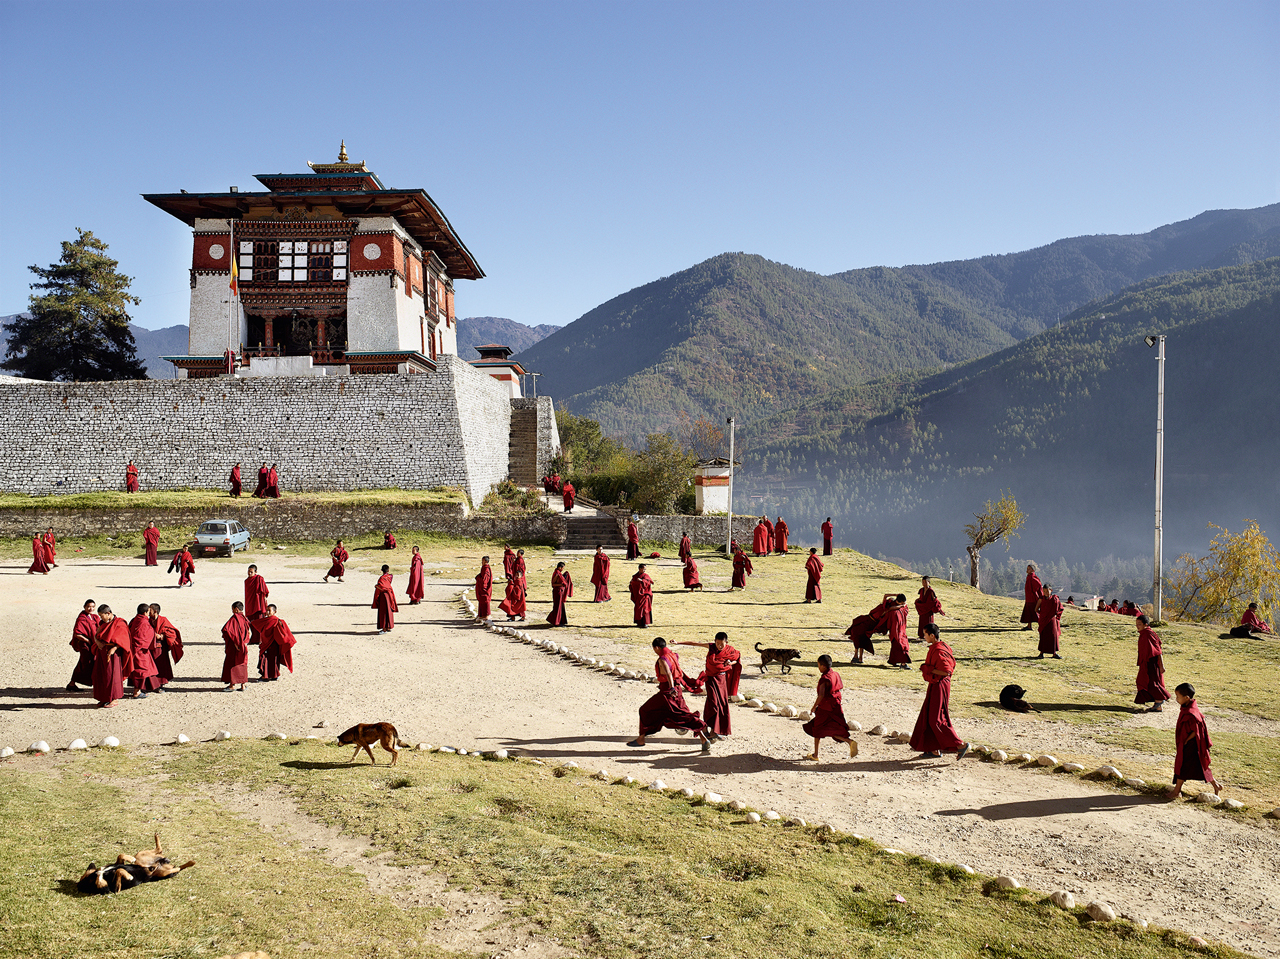 JAMES MOLLISON Dechen Phodrang, Thimphu, Bhutan, November 24, 2011